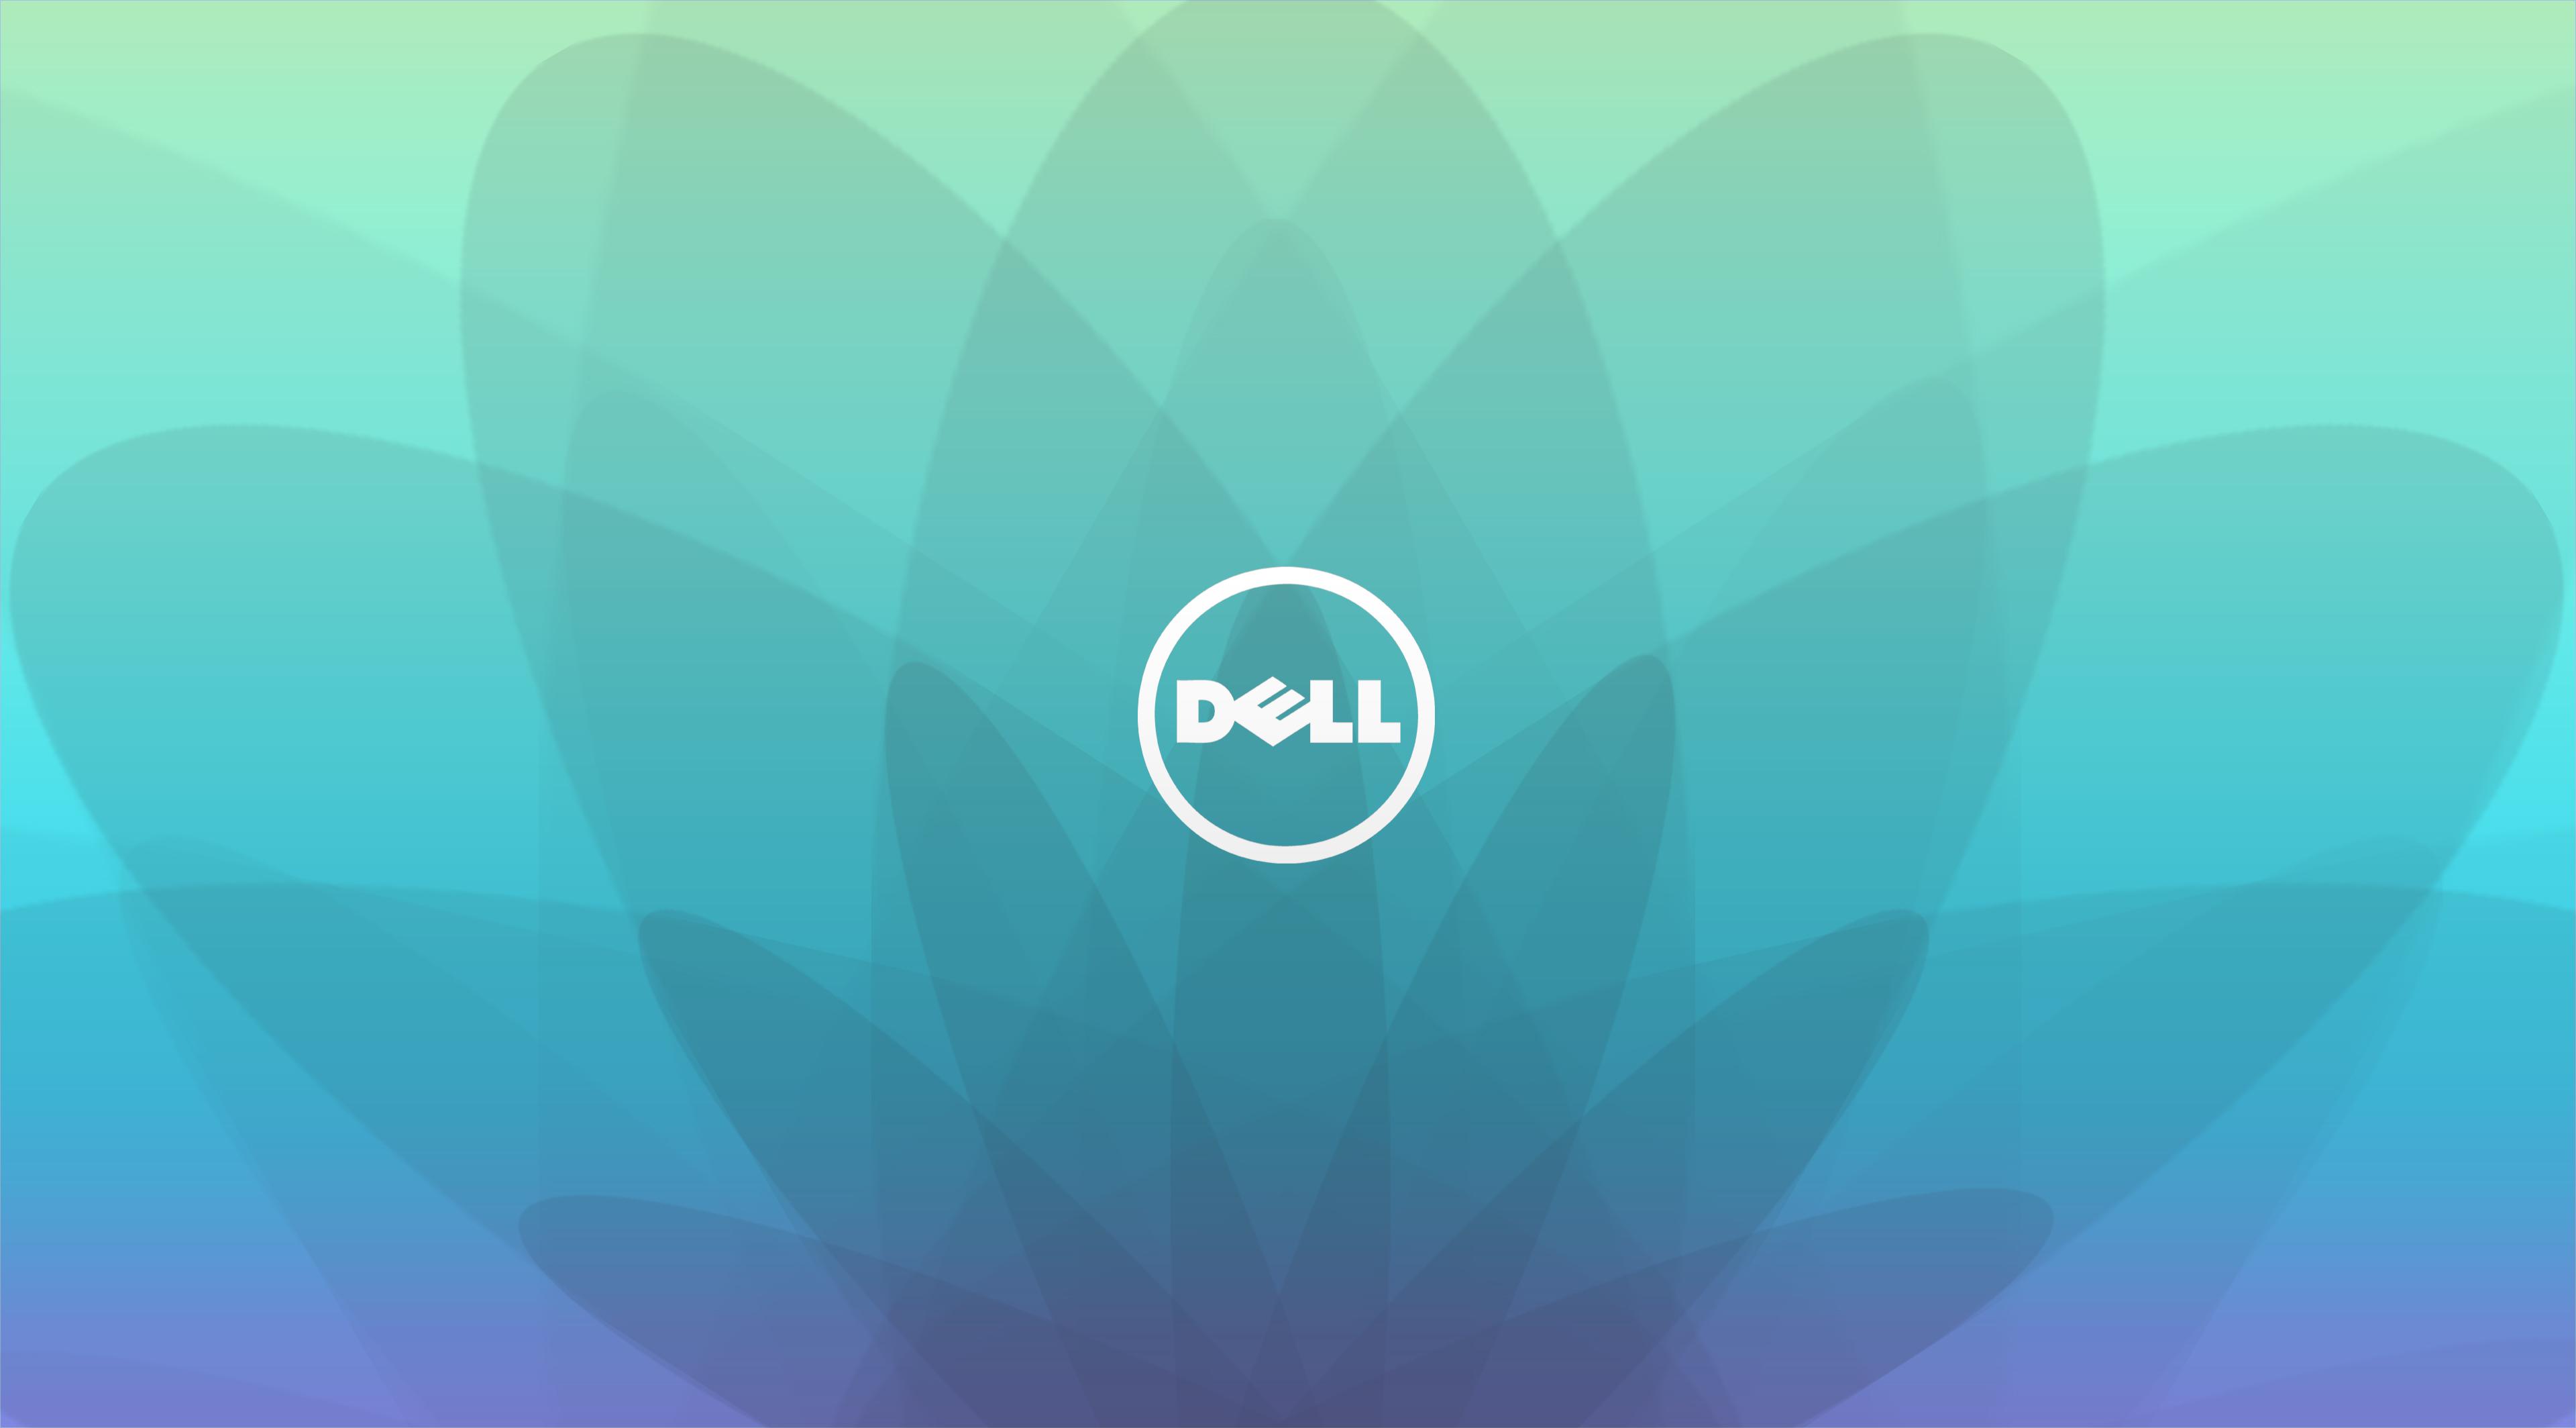 Dell Wallpaper HD Wallpaper   Background Image   20x20